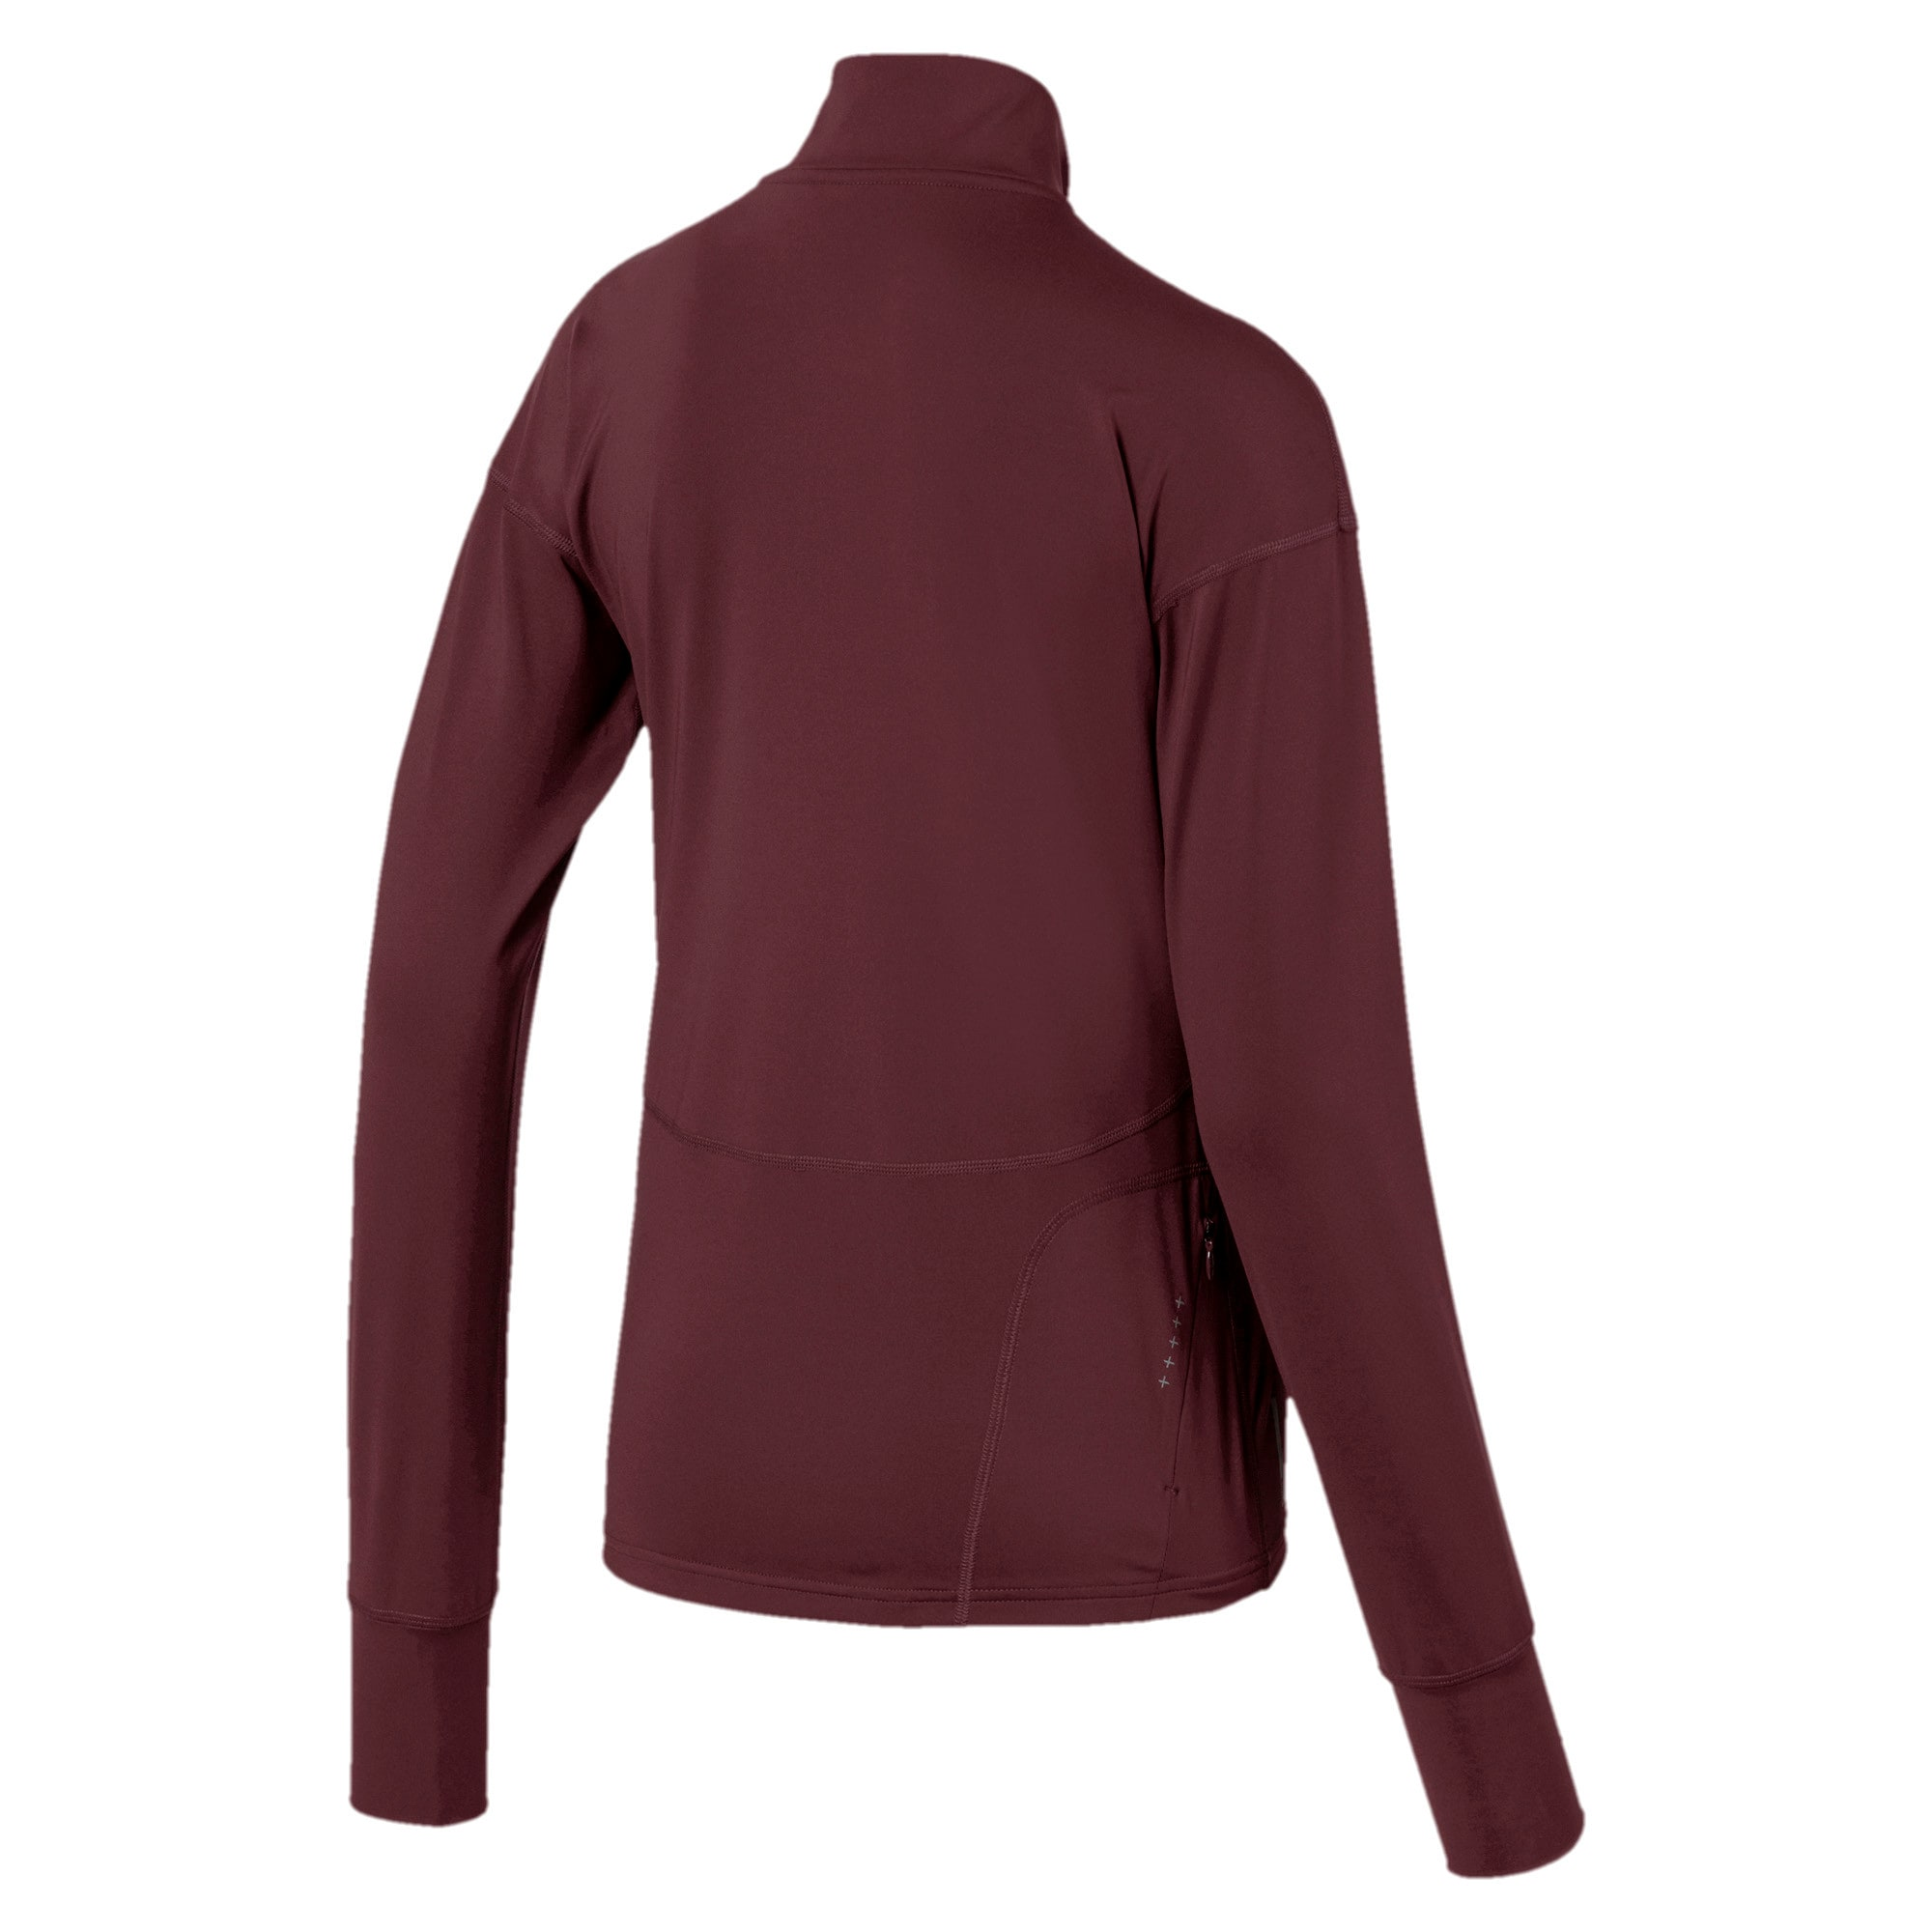 Thumbnail 5 of ADHM 2019 IGNITE Long Sleeve Women's Running Pullover, Vineyard Wine, medium-IND